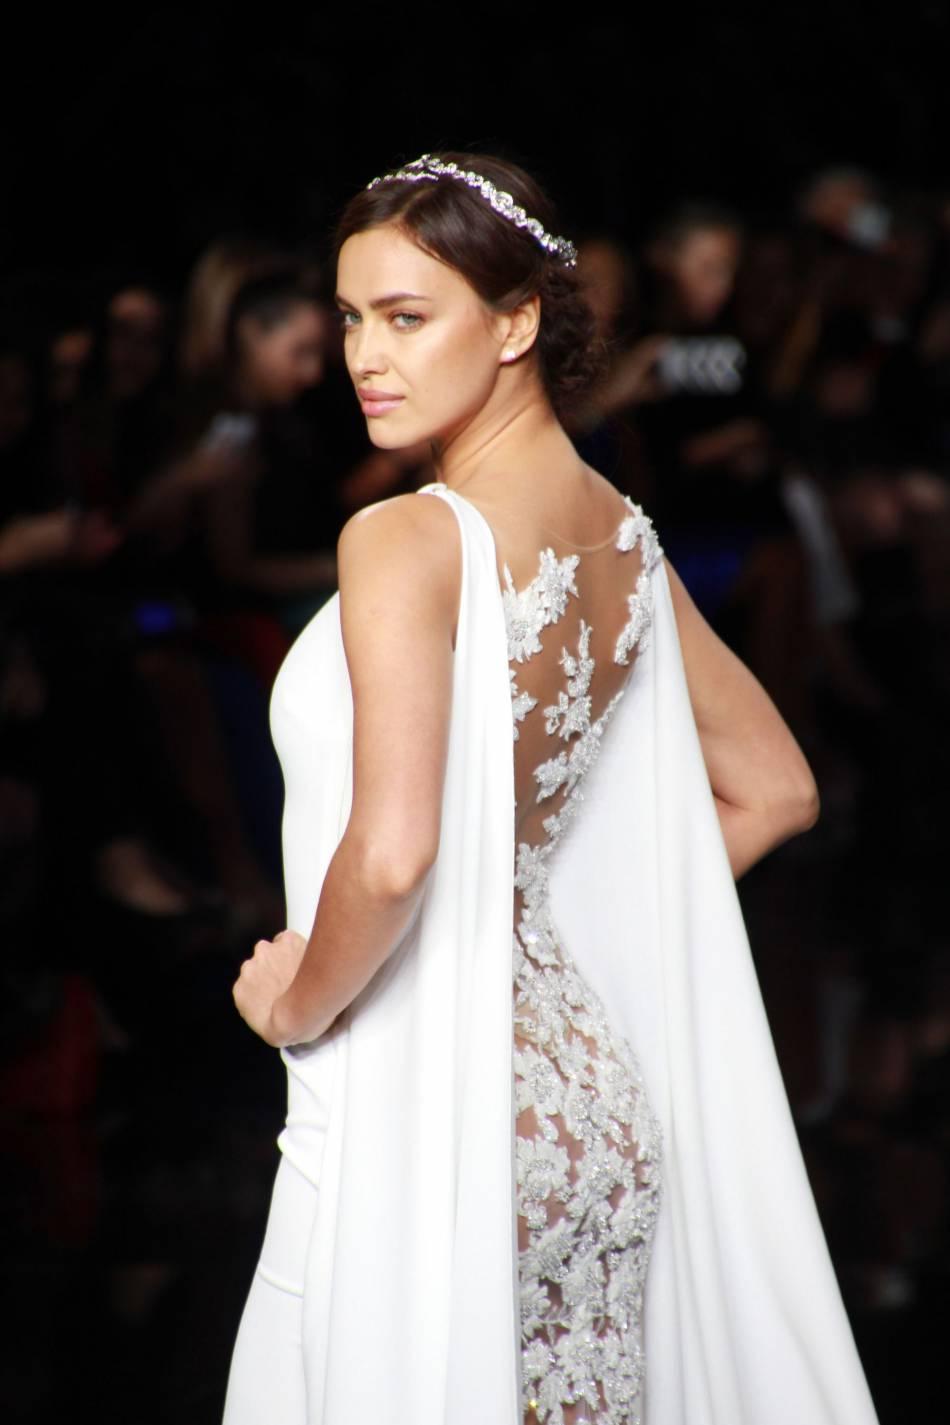 Irina Shayk défile lors de la Bridal Fashion Week de Barcelone le 29 avril 2016.